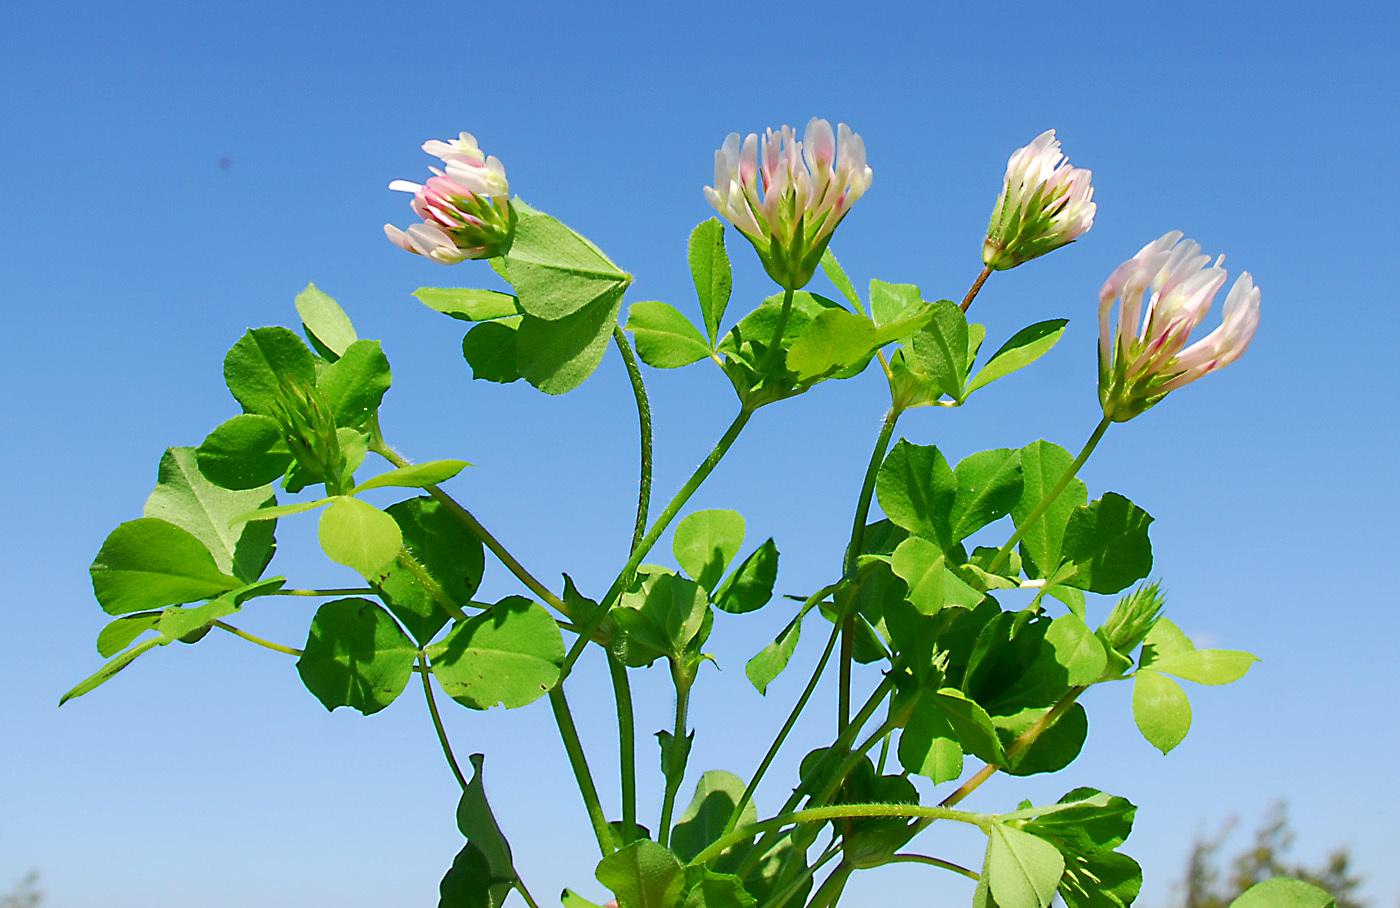 https://pictures.bgbm.org/digilib/Scaler?fn=Cyprus/Trifolium_clypeatum_A1.jpg&mo=file